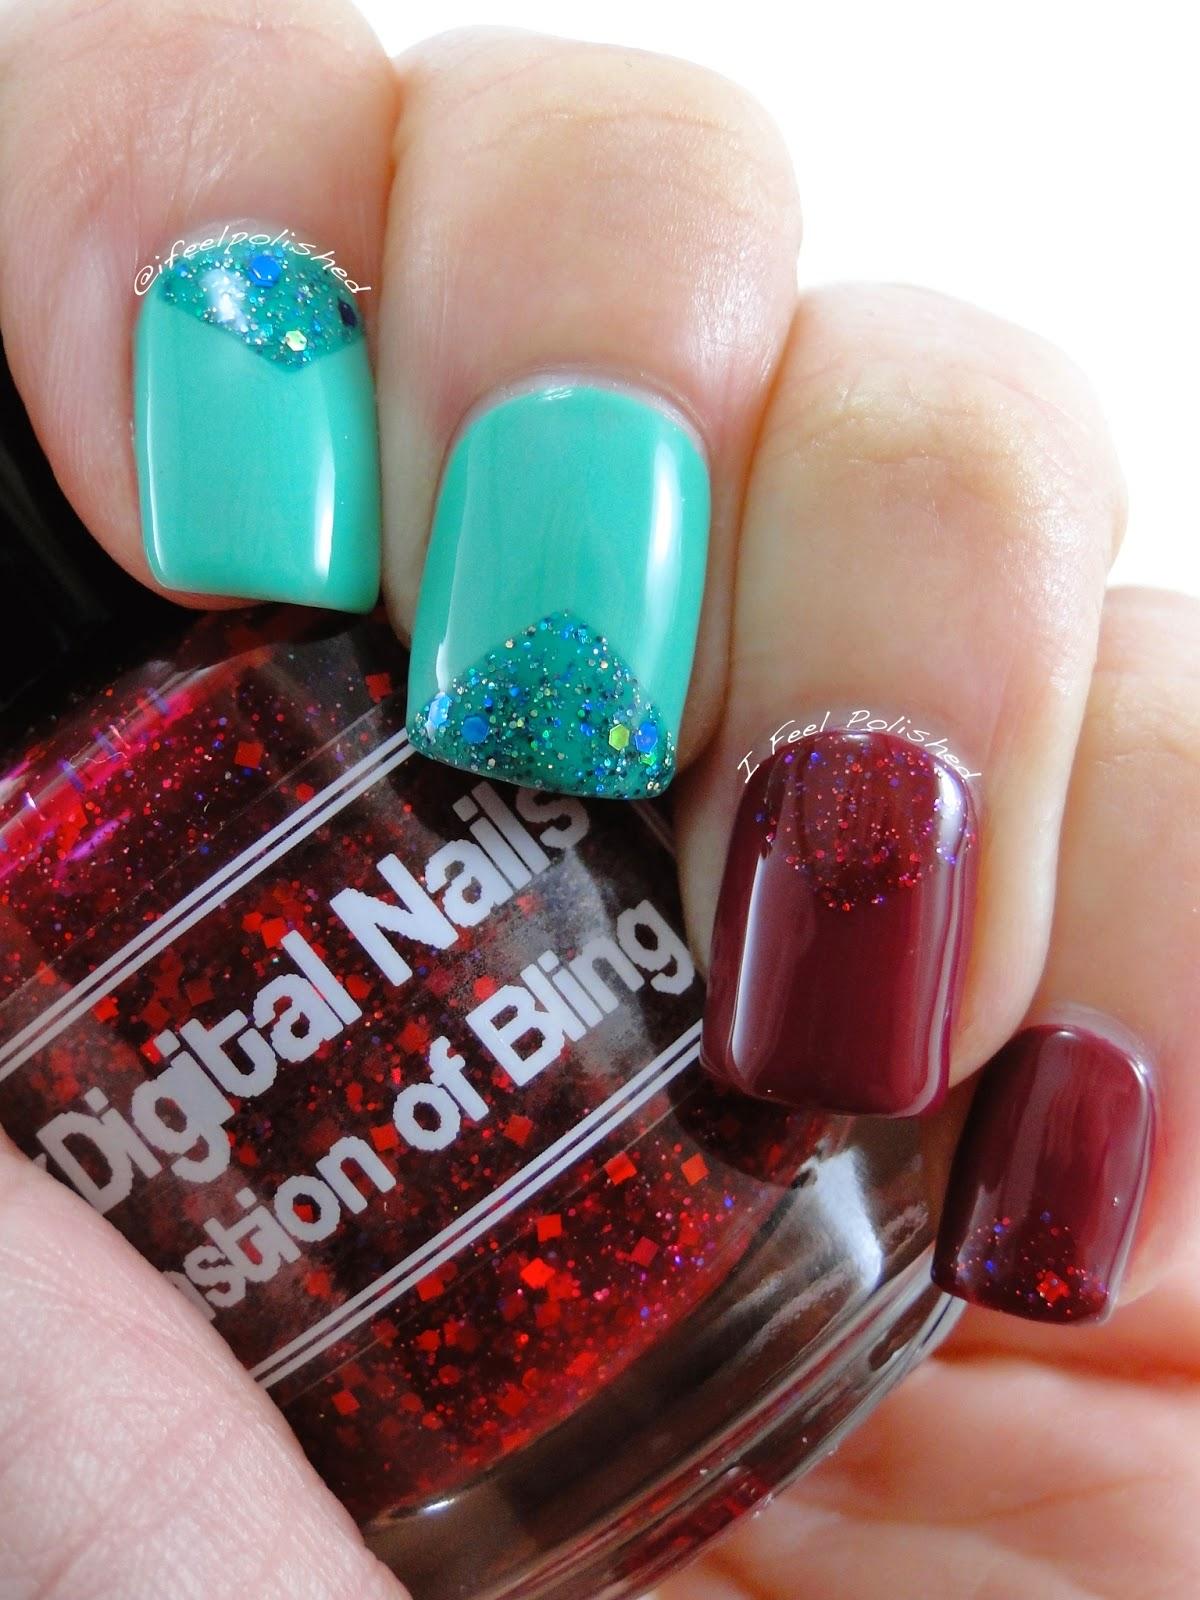 Digital Nails Bastion of Bling